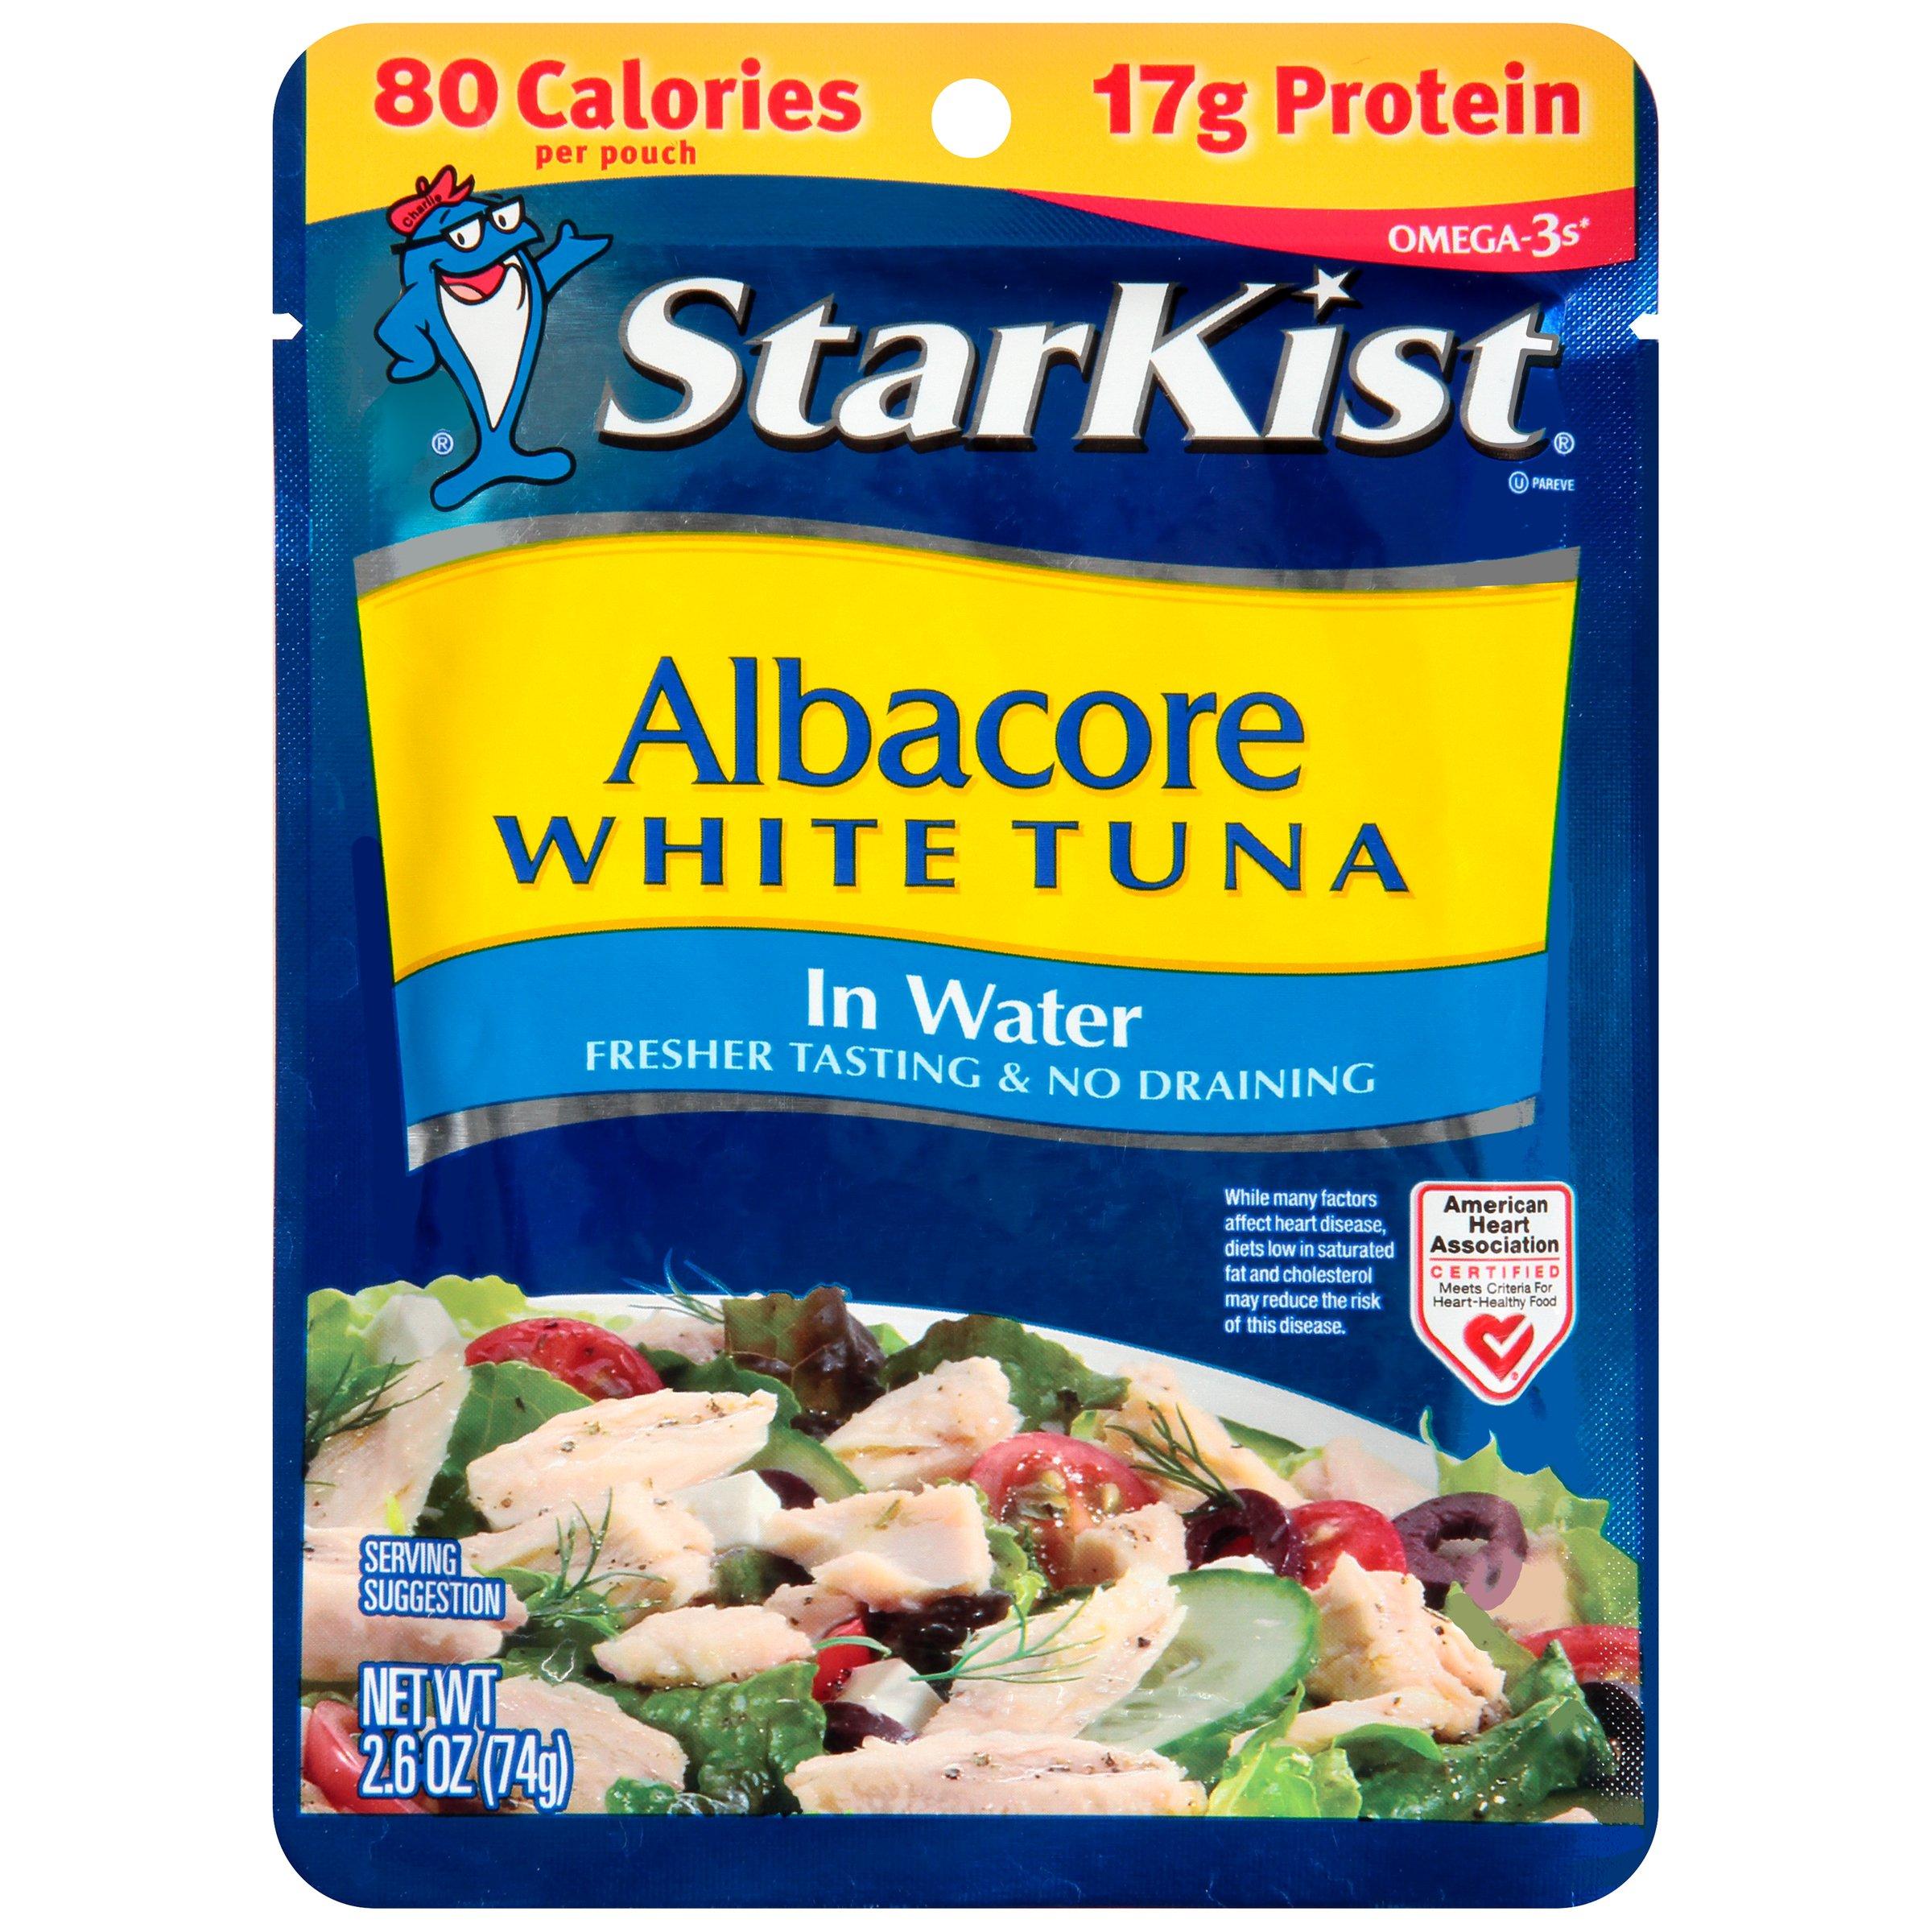 StarKist Albacore White Tuna in Water, 12 Count